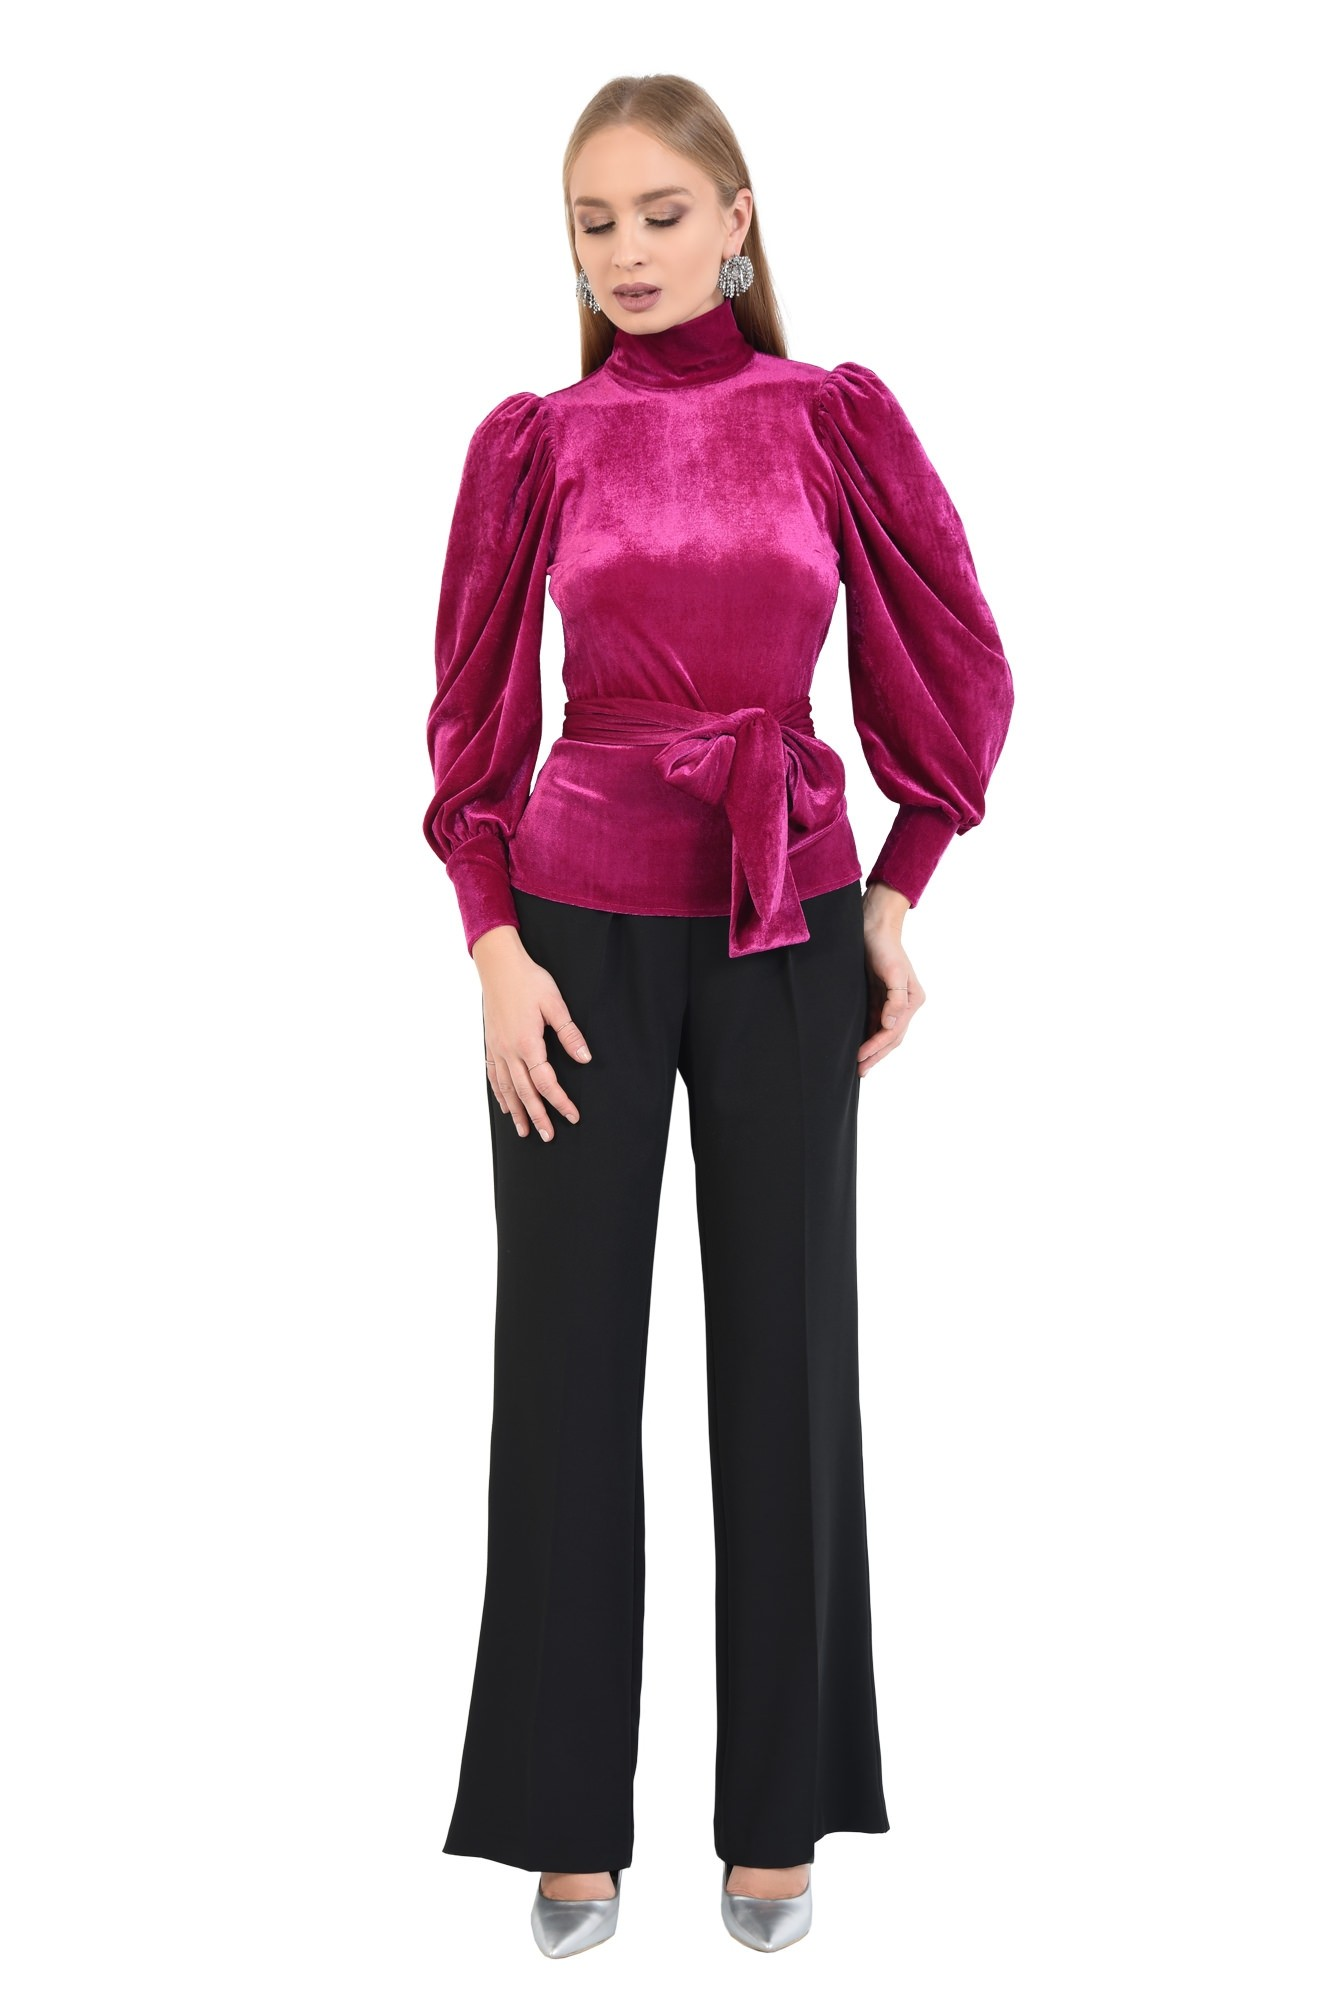 360 - bluza eleganta, roz ciclam, maneci bufante, funda la talie